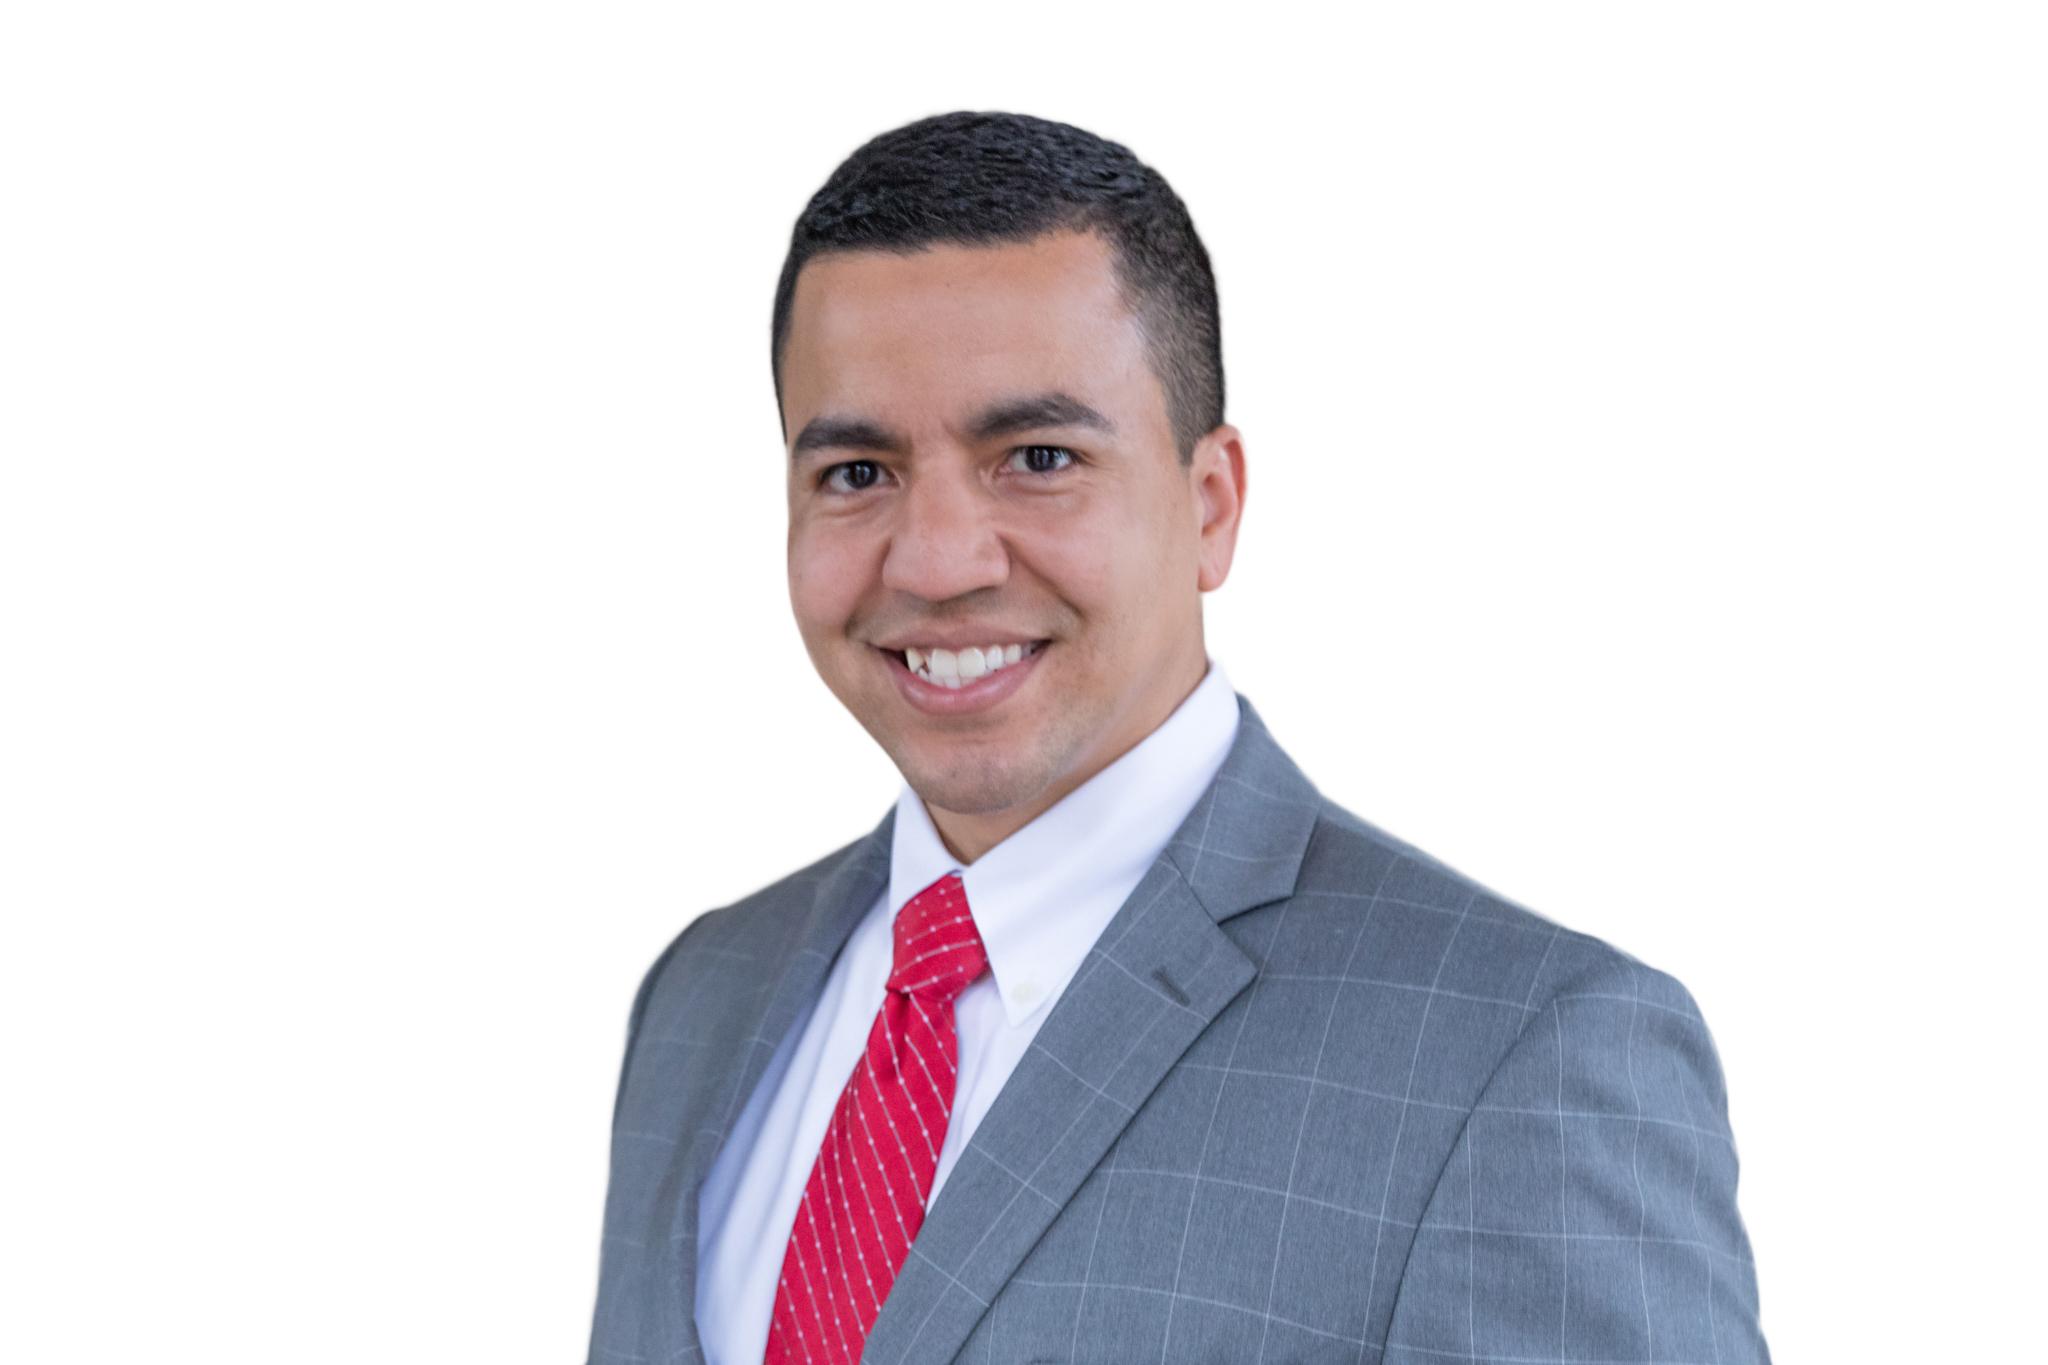 Daniel J. Betancourt